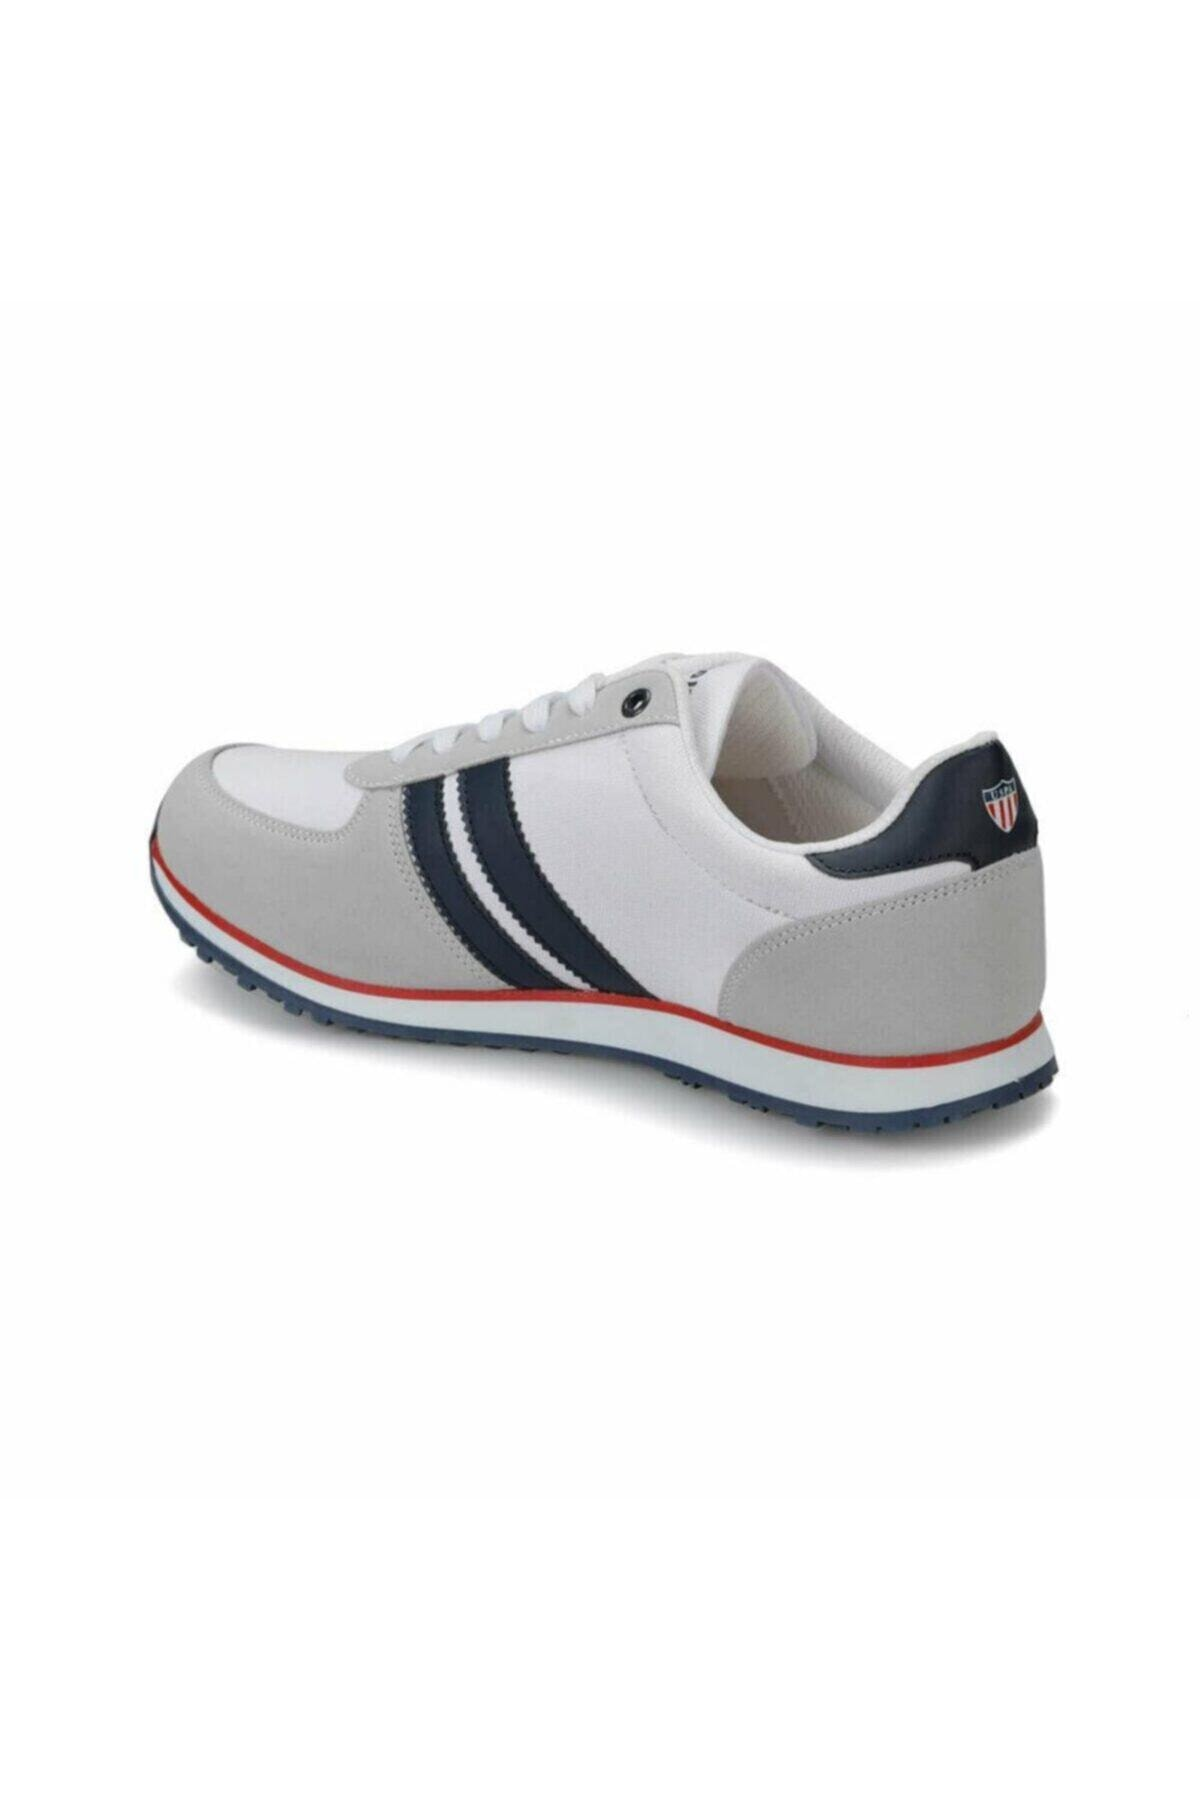 U.S. Polo Assn. Erkek Beyaz Sneaker Plus10048390 2